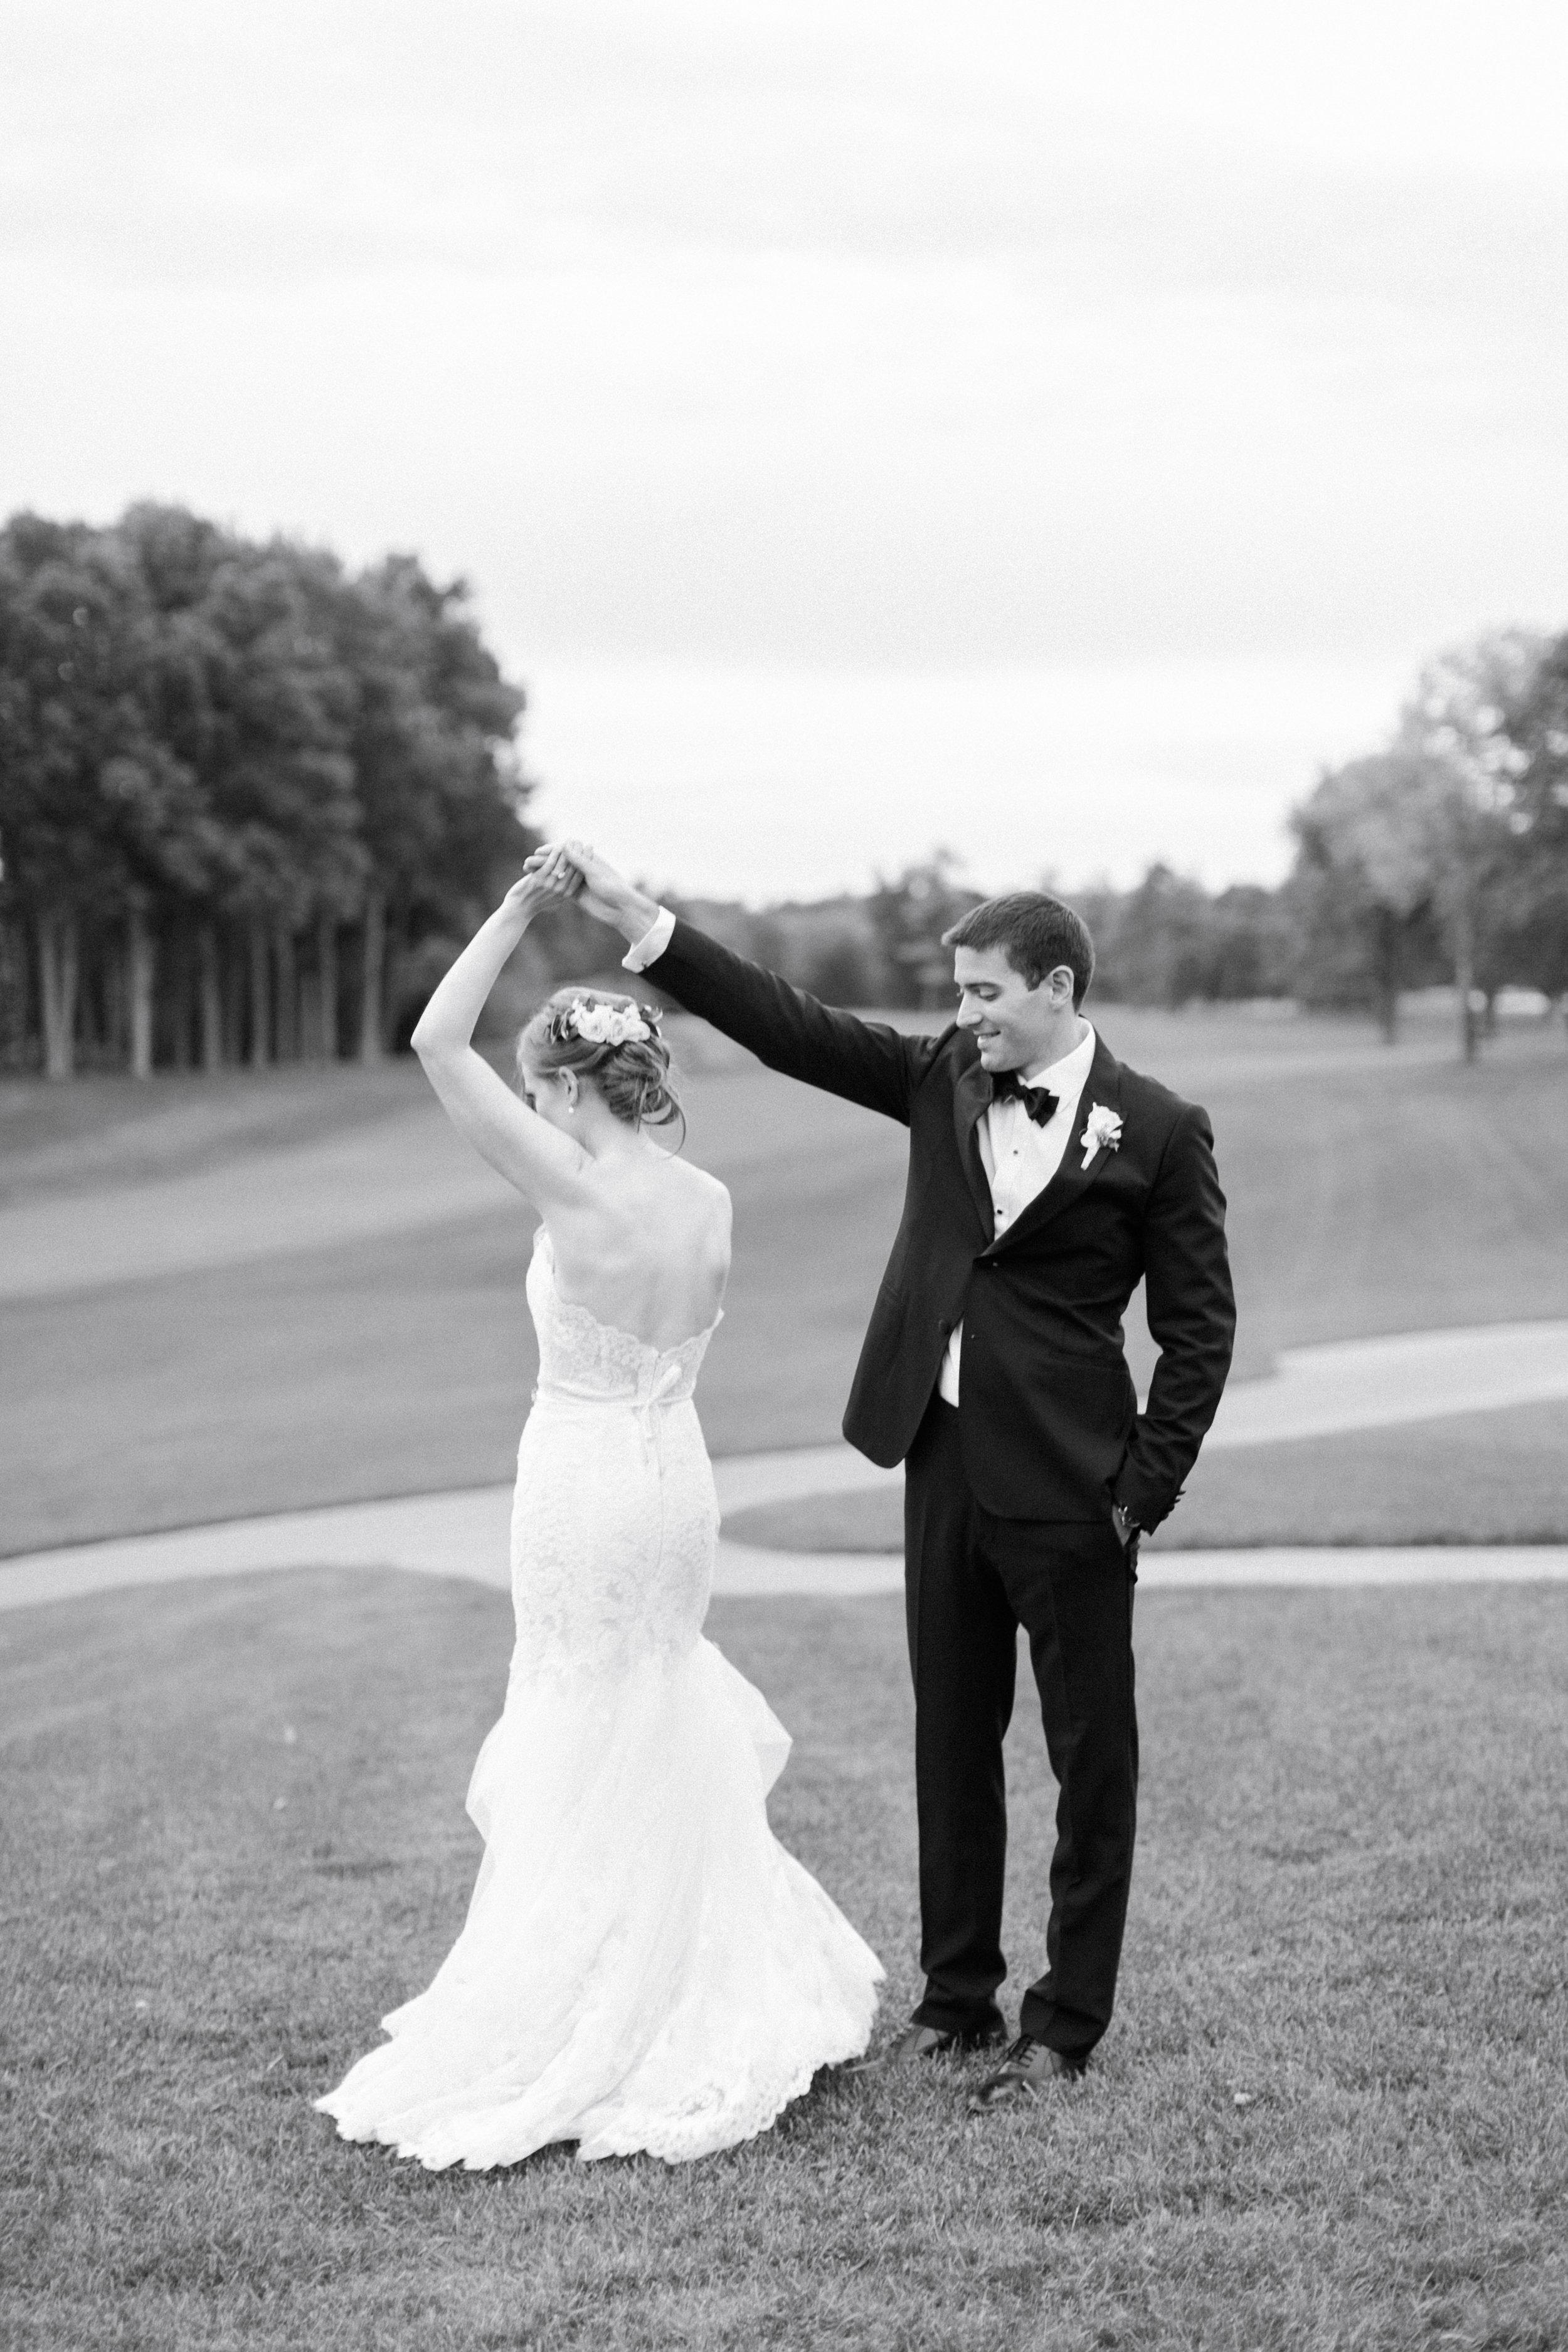 london-hunt-club-toronto-wedding-photographer-bright-richelle-hunter-jewish-ceremony-jessica-shemer-1006.jpg